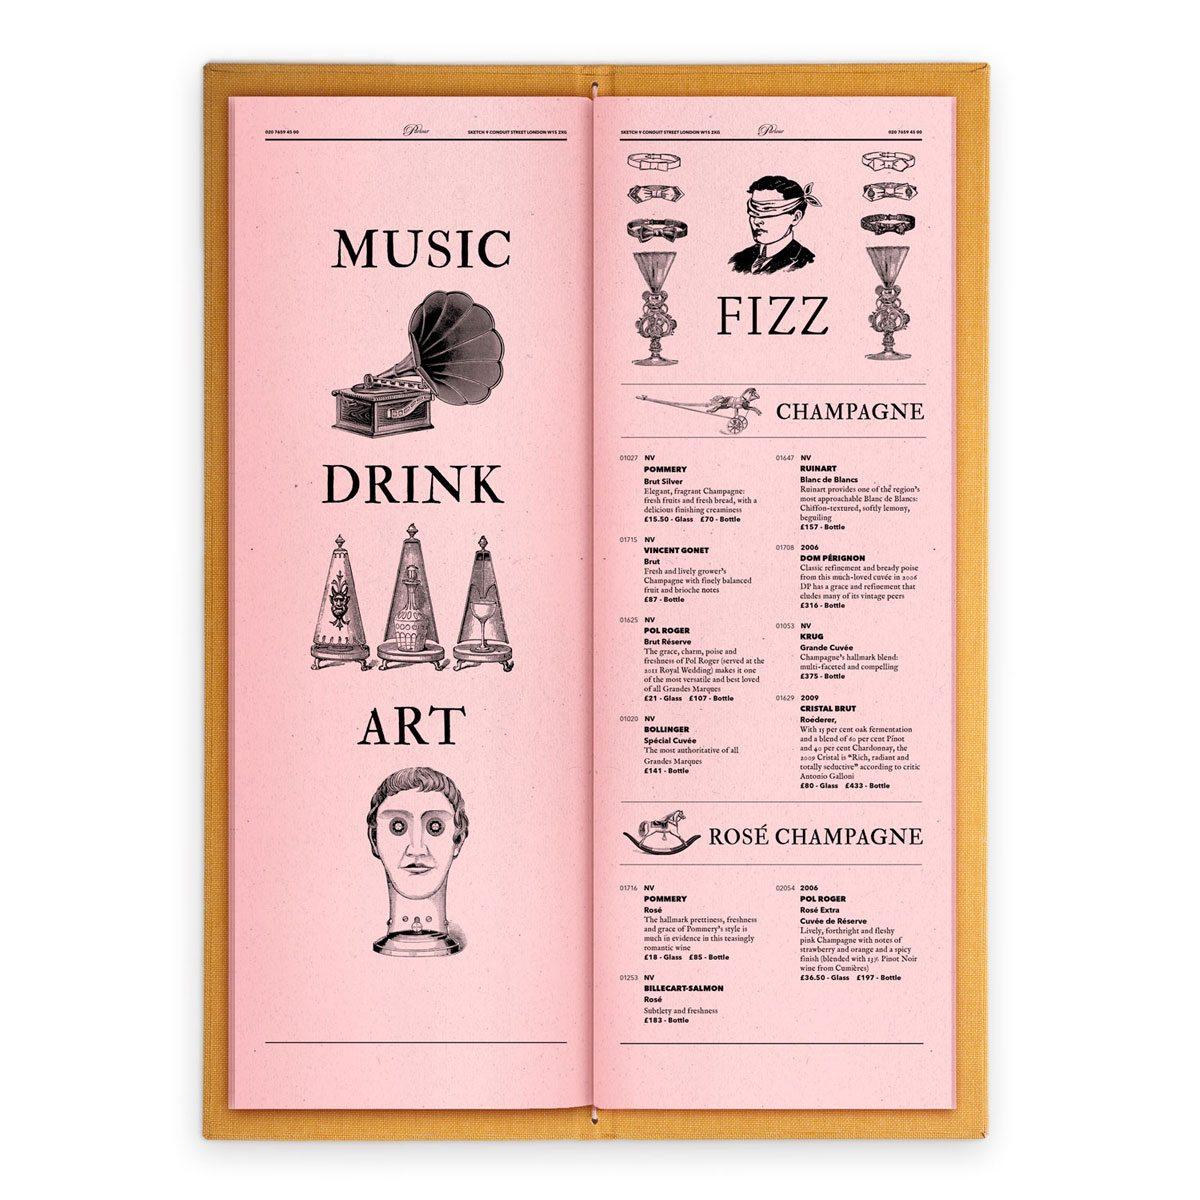 sketch london wine list parlour pinkn gravures anciennes engraving vintage punk champagne